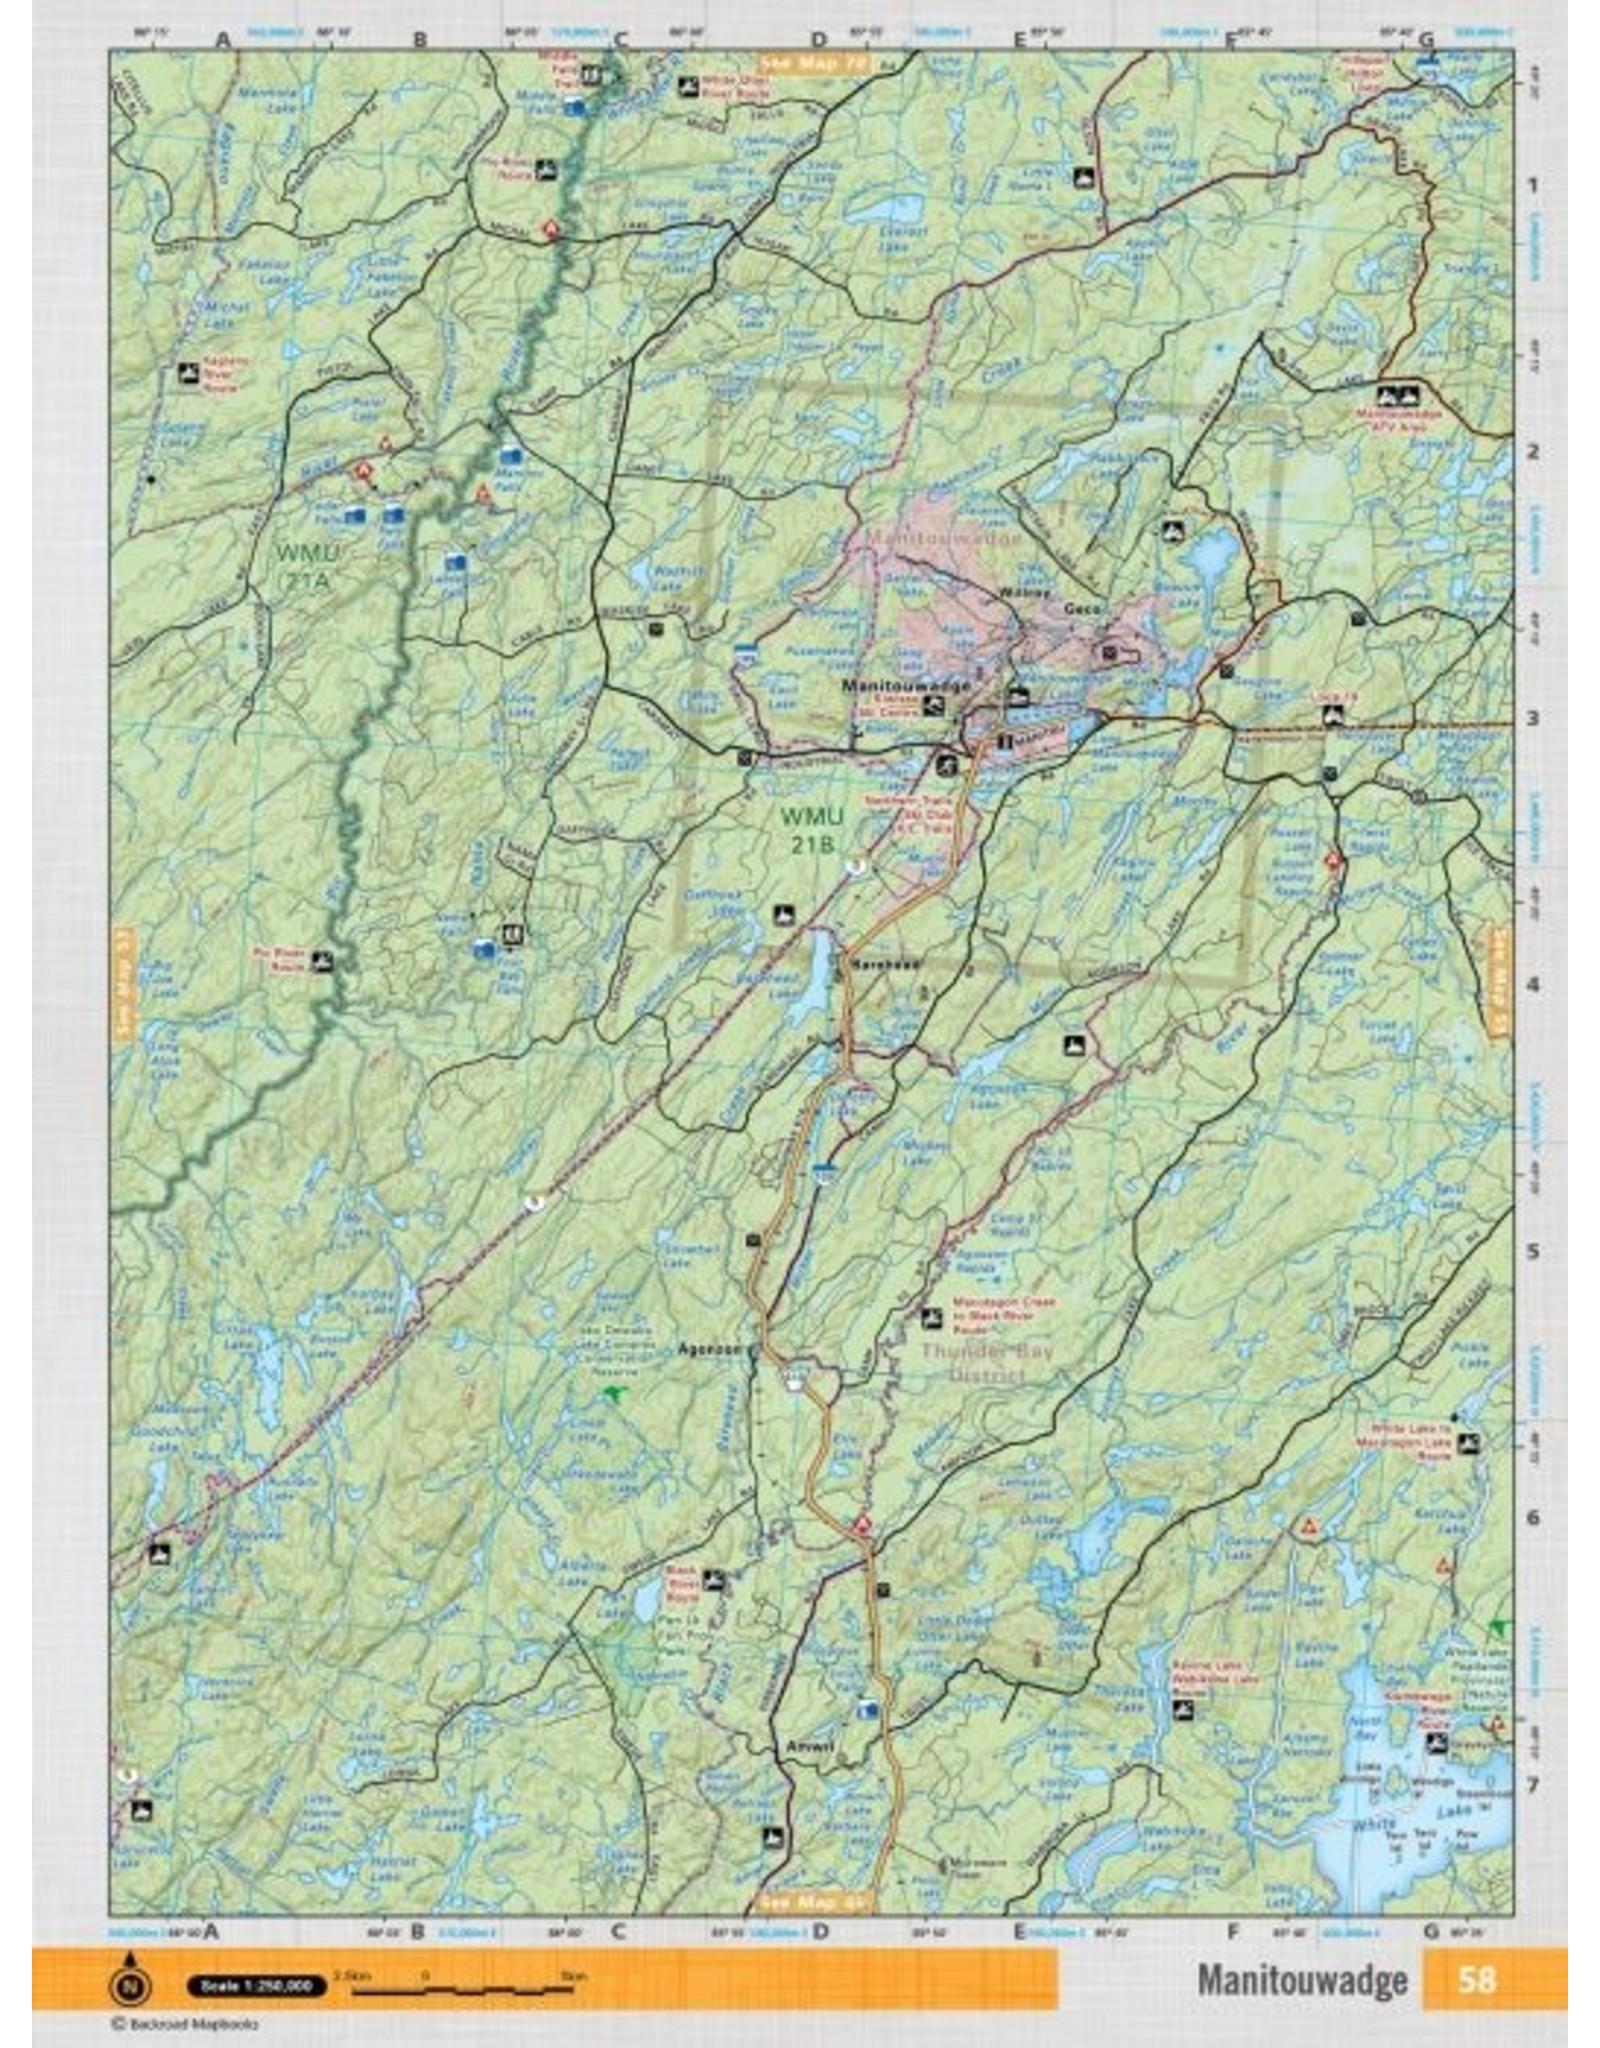 Backroad Mapbooks Backroads Mapbooks ON TOPO MAP WATERPROOF MAP NEON-58 Manitouwadge